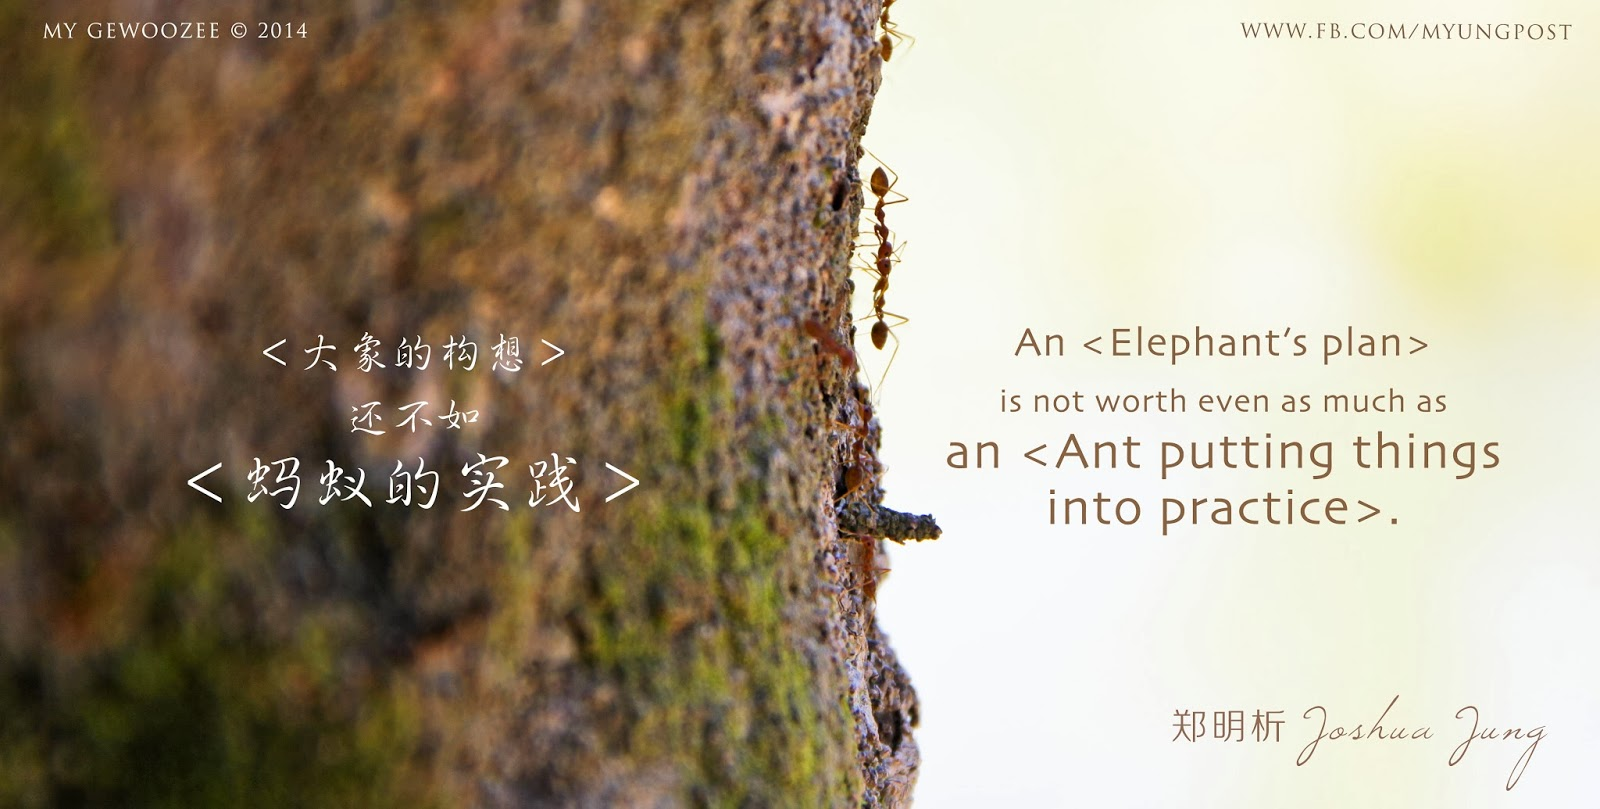 郑明析,摄理,蚂蚁,大象,构想,Joshua Jung, Providence, Ant, Elephant, Plan